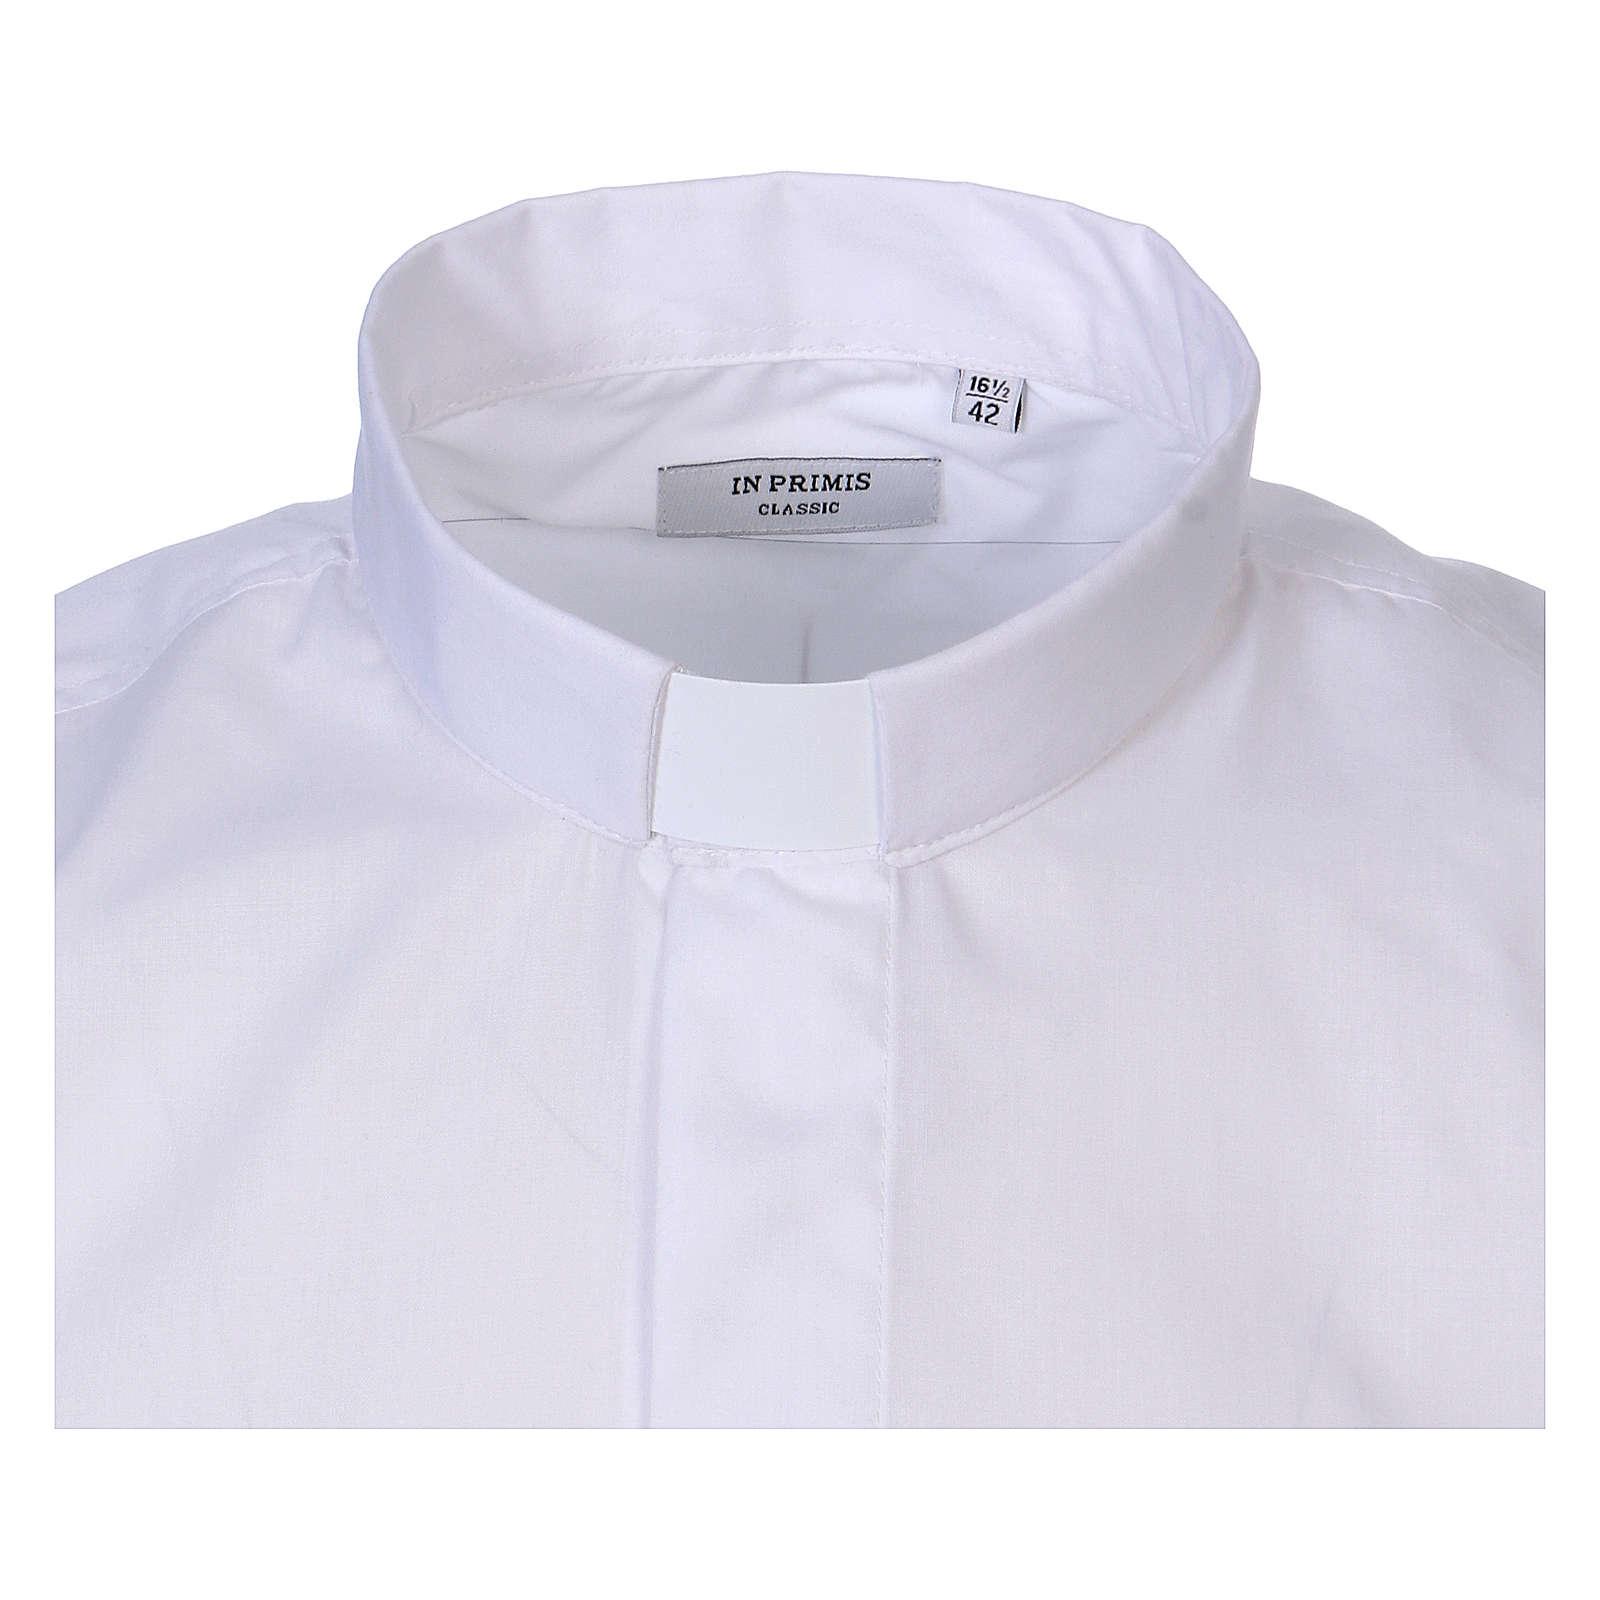 Chemise Clergy longues manches tissu mixte coton blanc In Primis 4